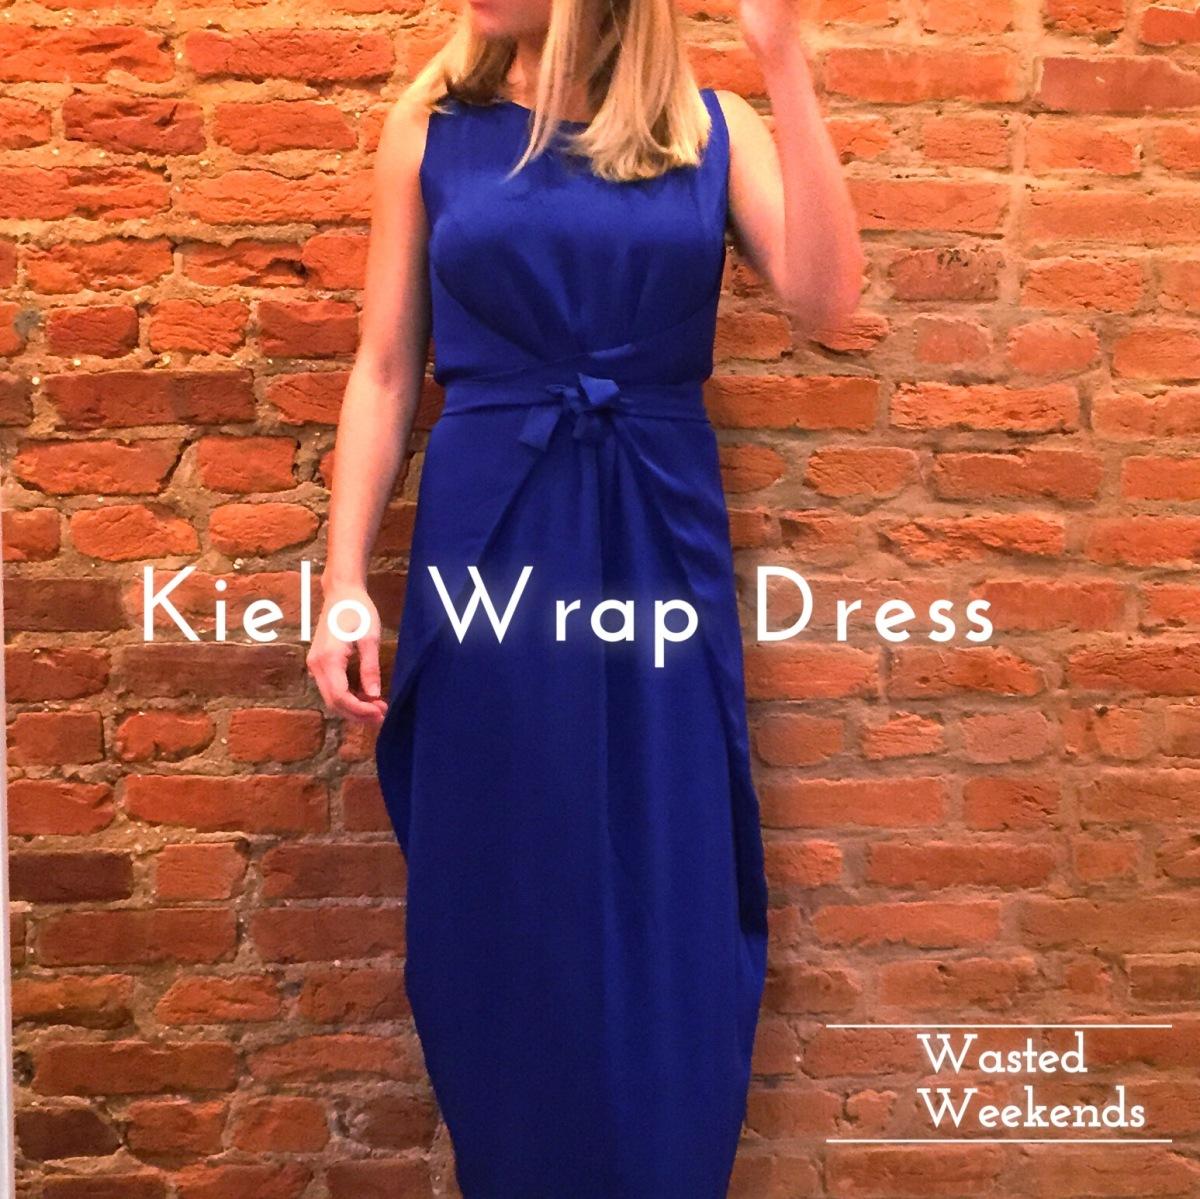 Dress Blues Kielo Wrap Dress Wasted Weekends